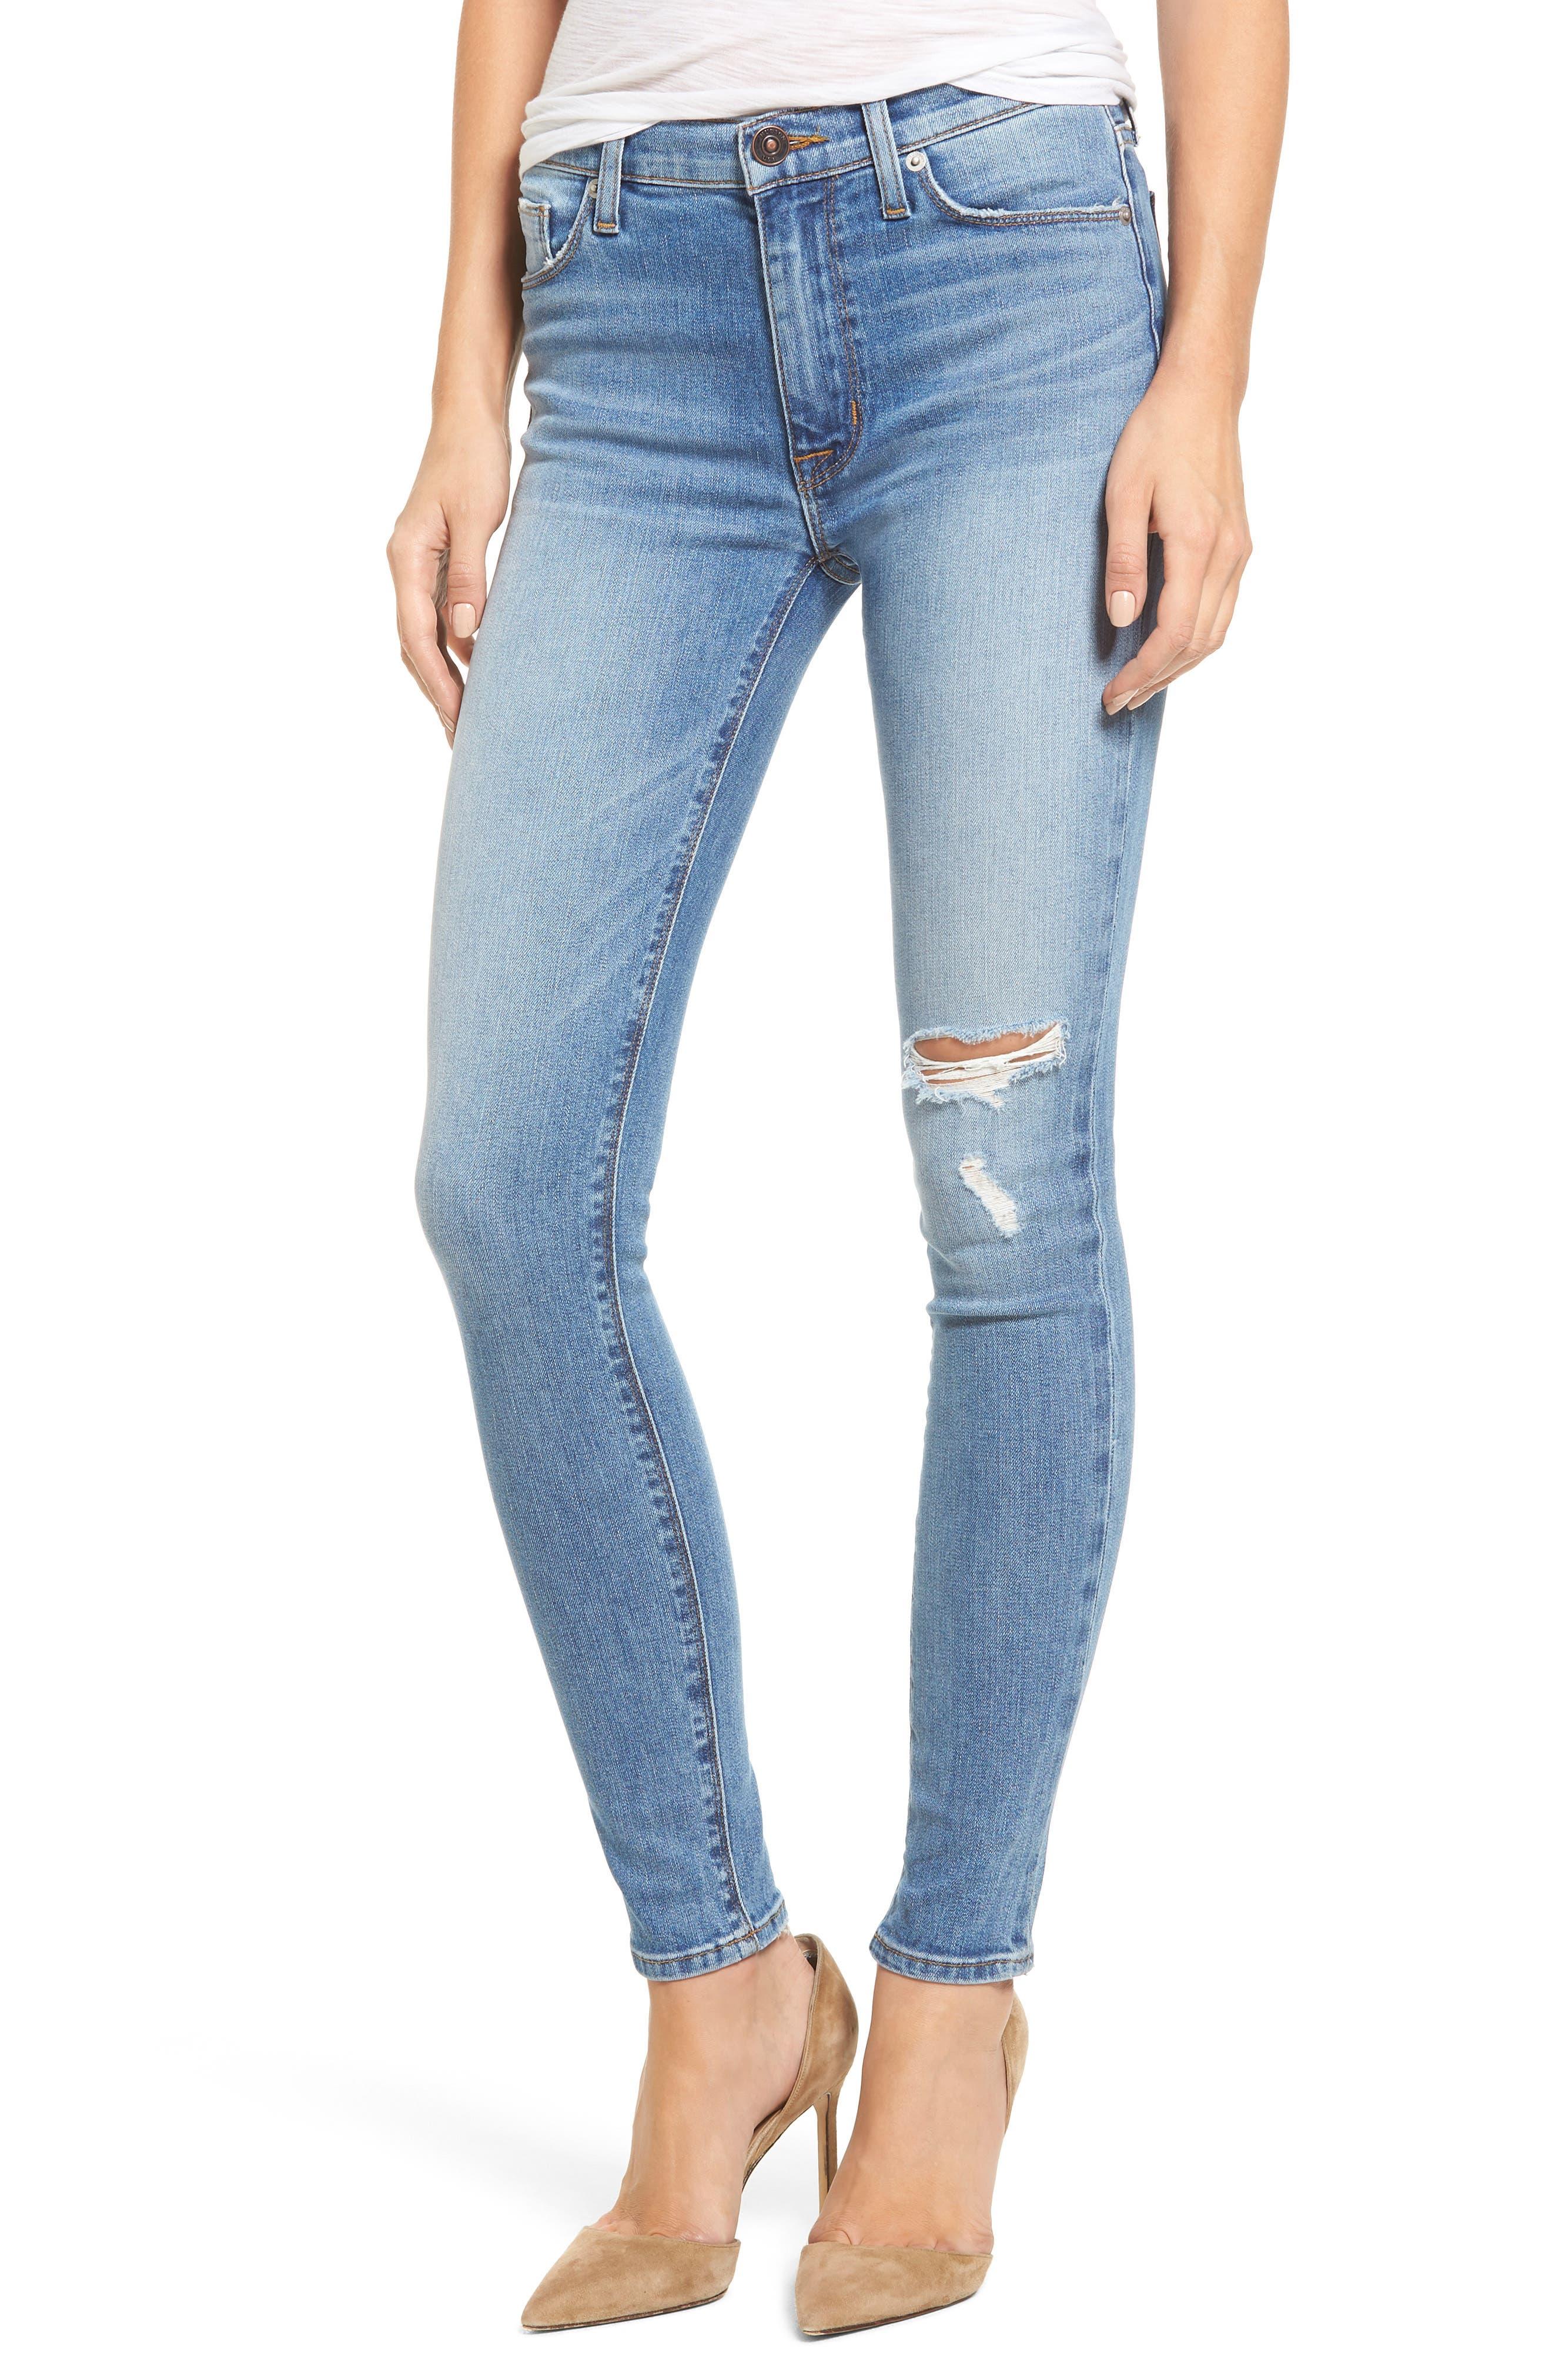 Alternate Image 1 Selected - Hudson Jeans Barbara High Waist Super Skinny Jeans